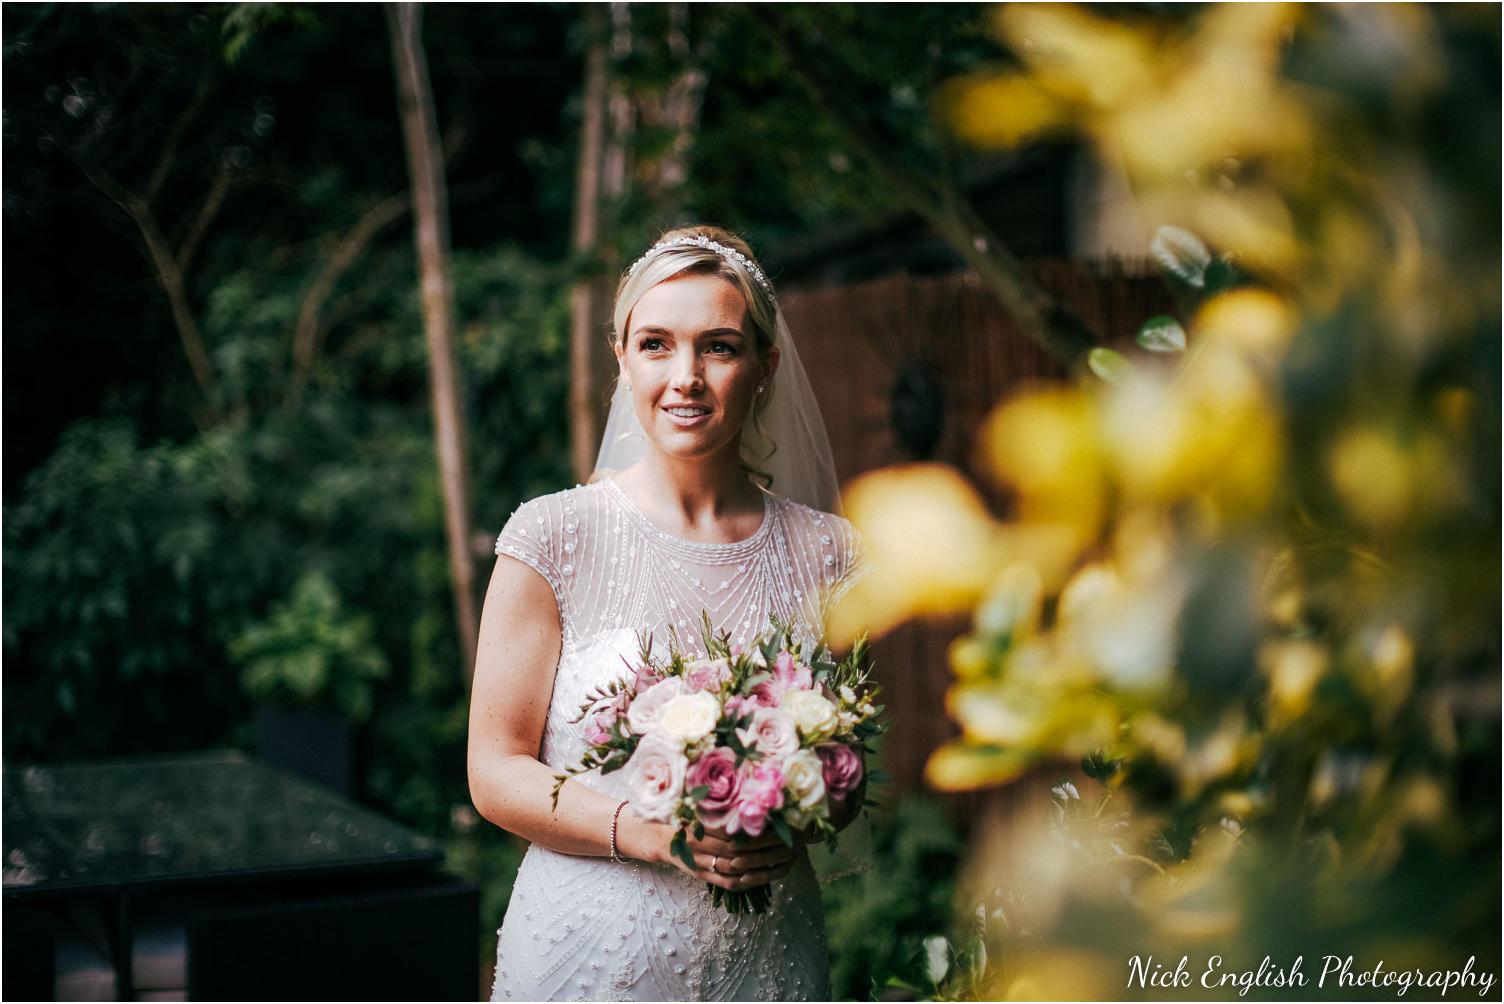 Mitton_Hall_Wedding_Photograph-31.jpg